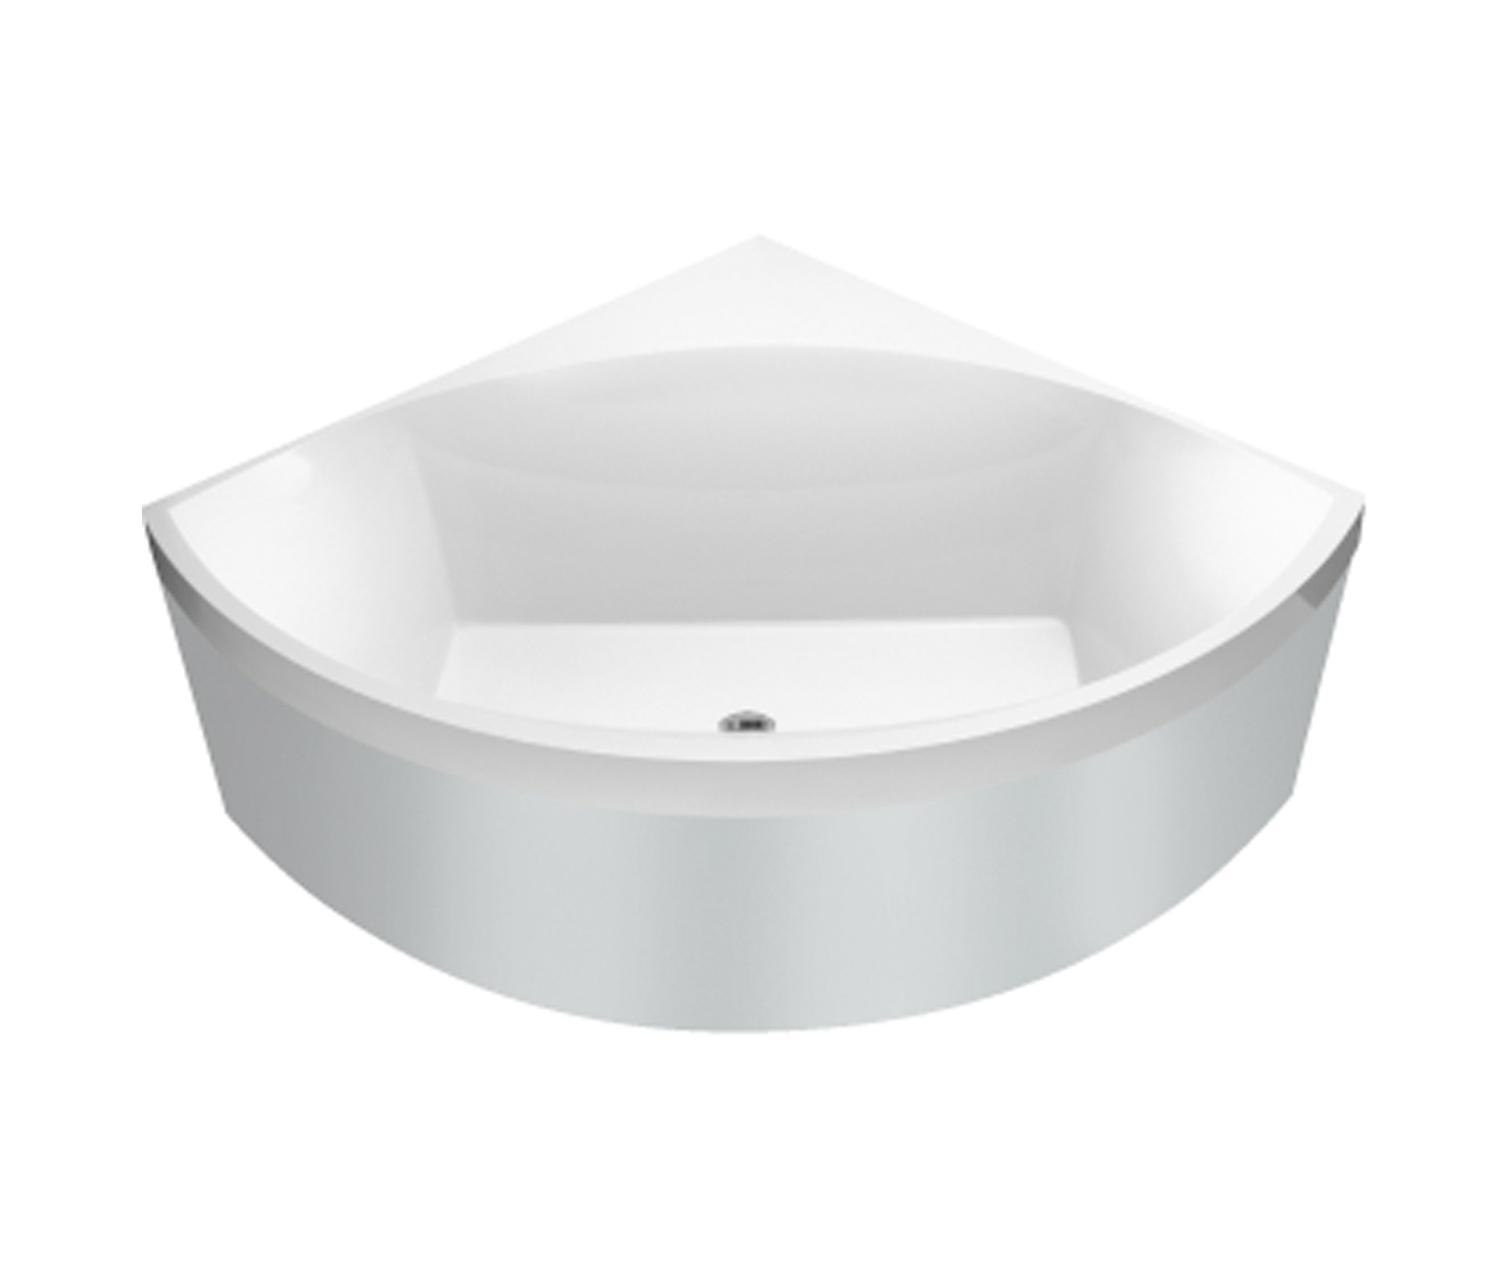 Squaro vasca da bagno vasche ad incasso villeroy boch architonic - Vasca da bagno villeroy e boch ...